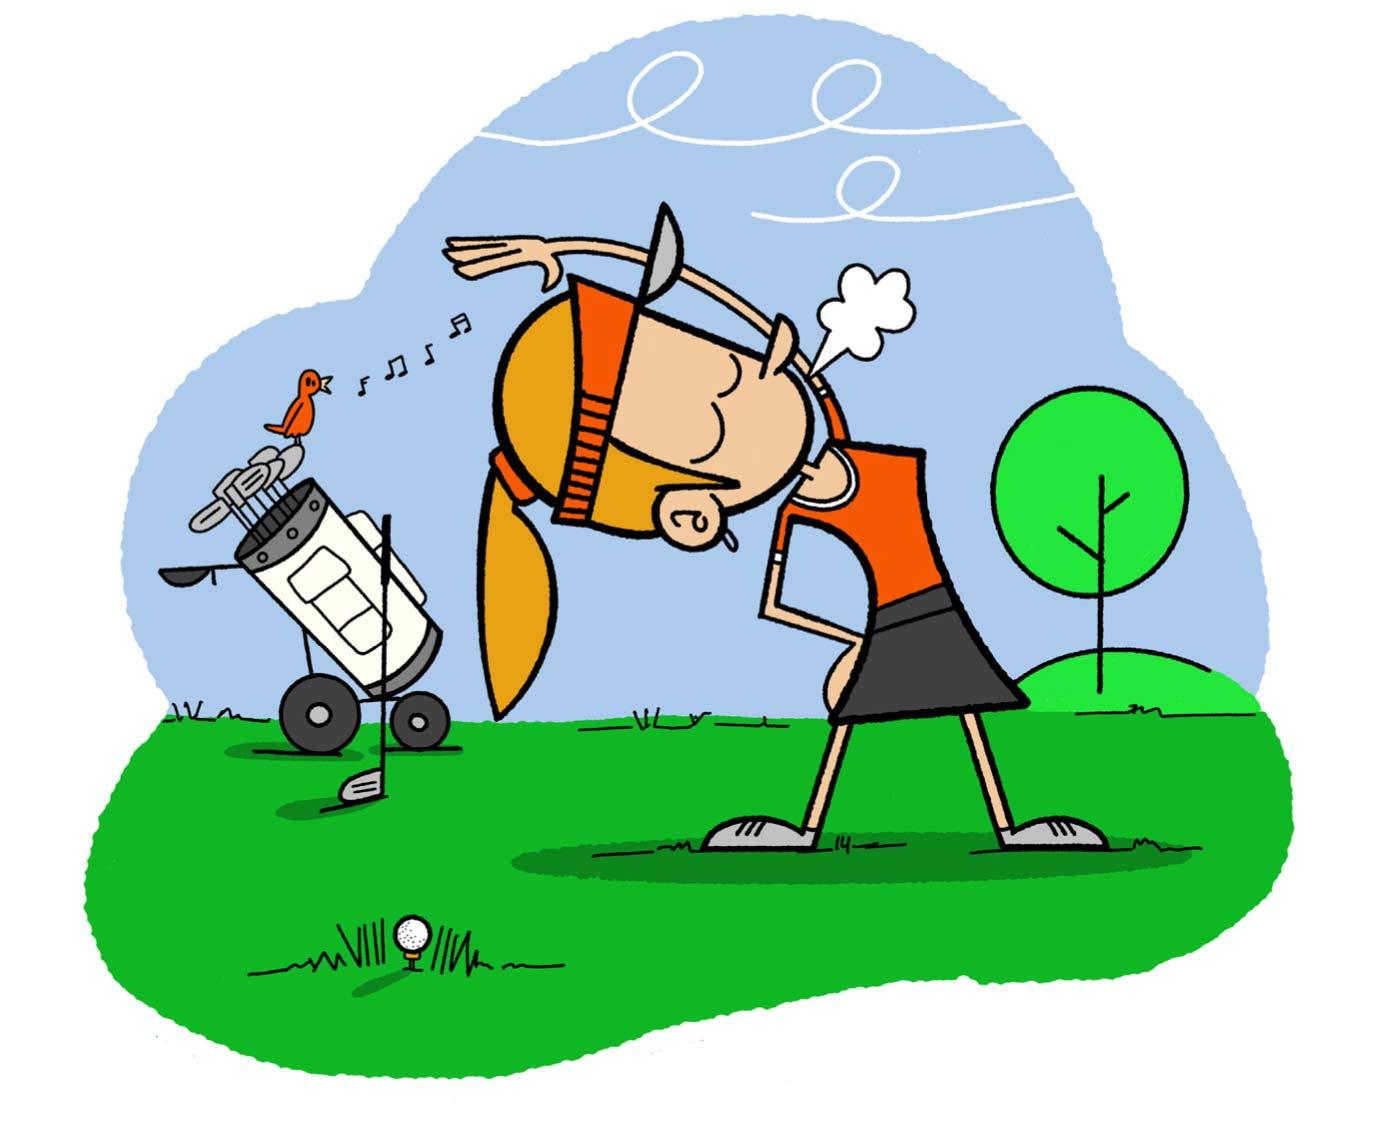 Practice Golf Cartoon One